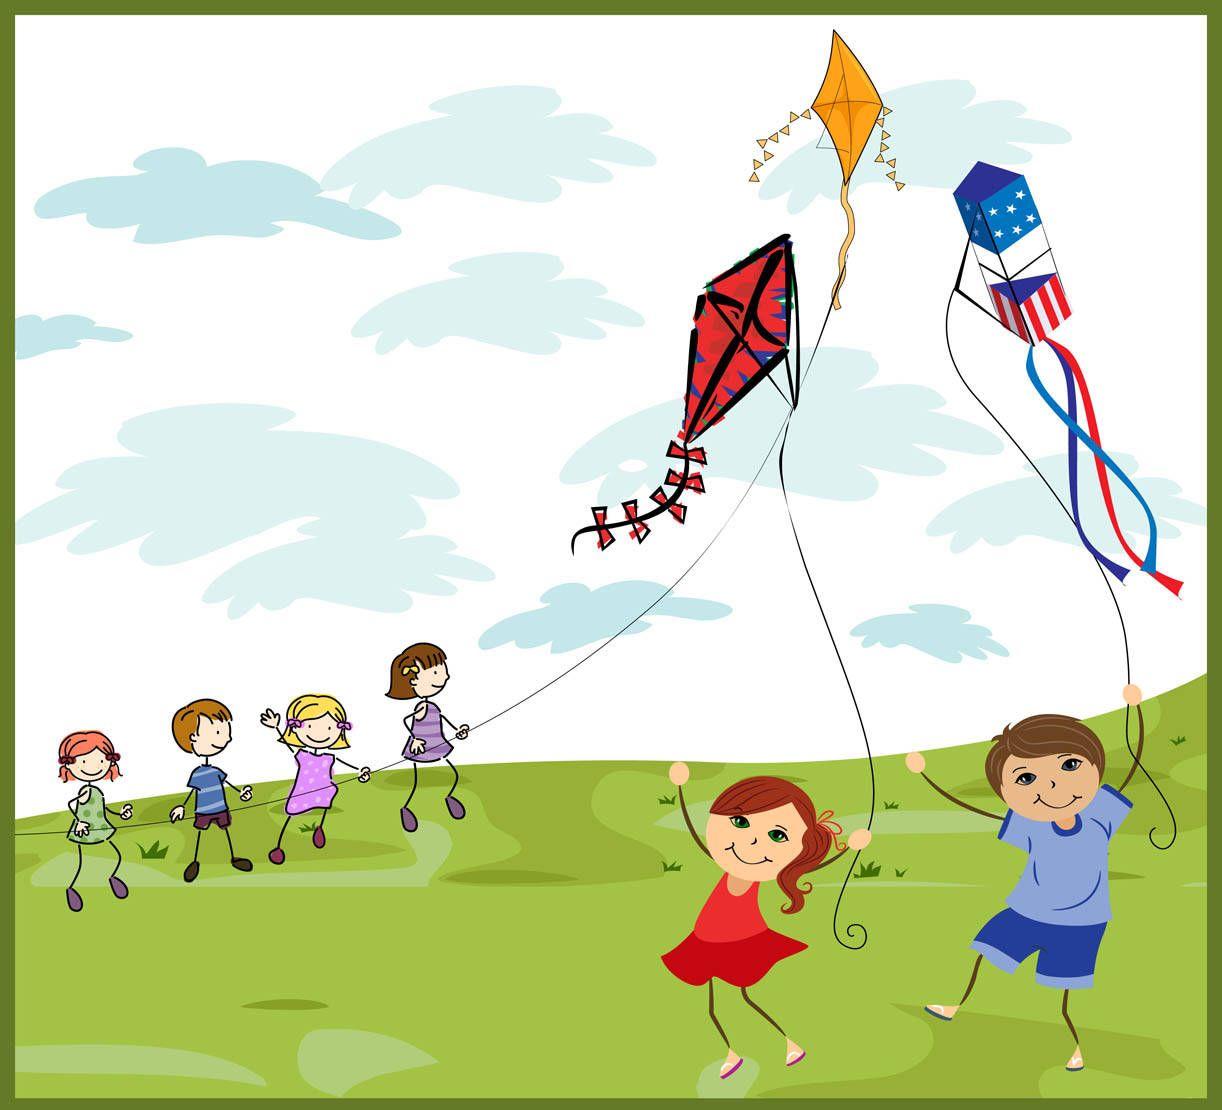 Kite clipart group. Kites clip art doodles